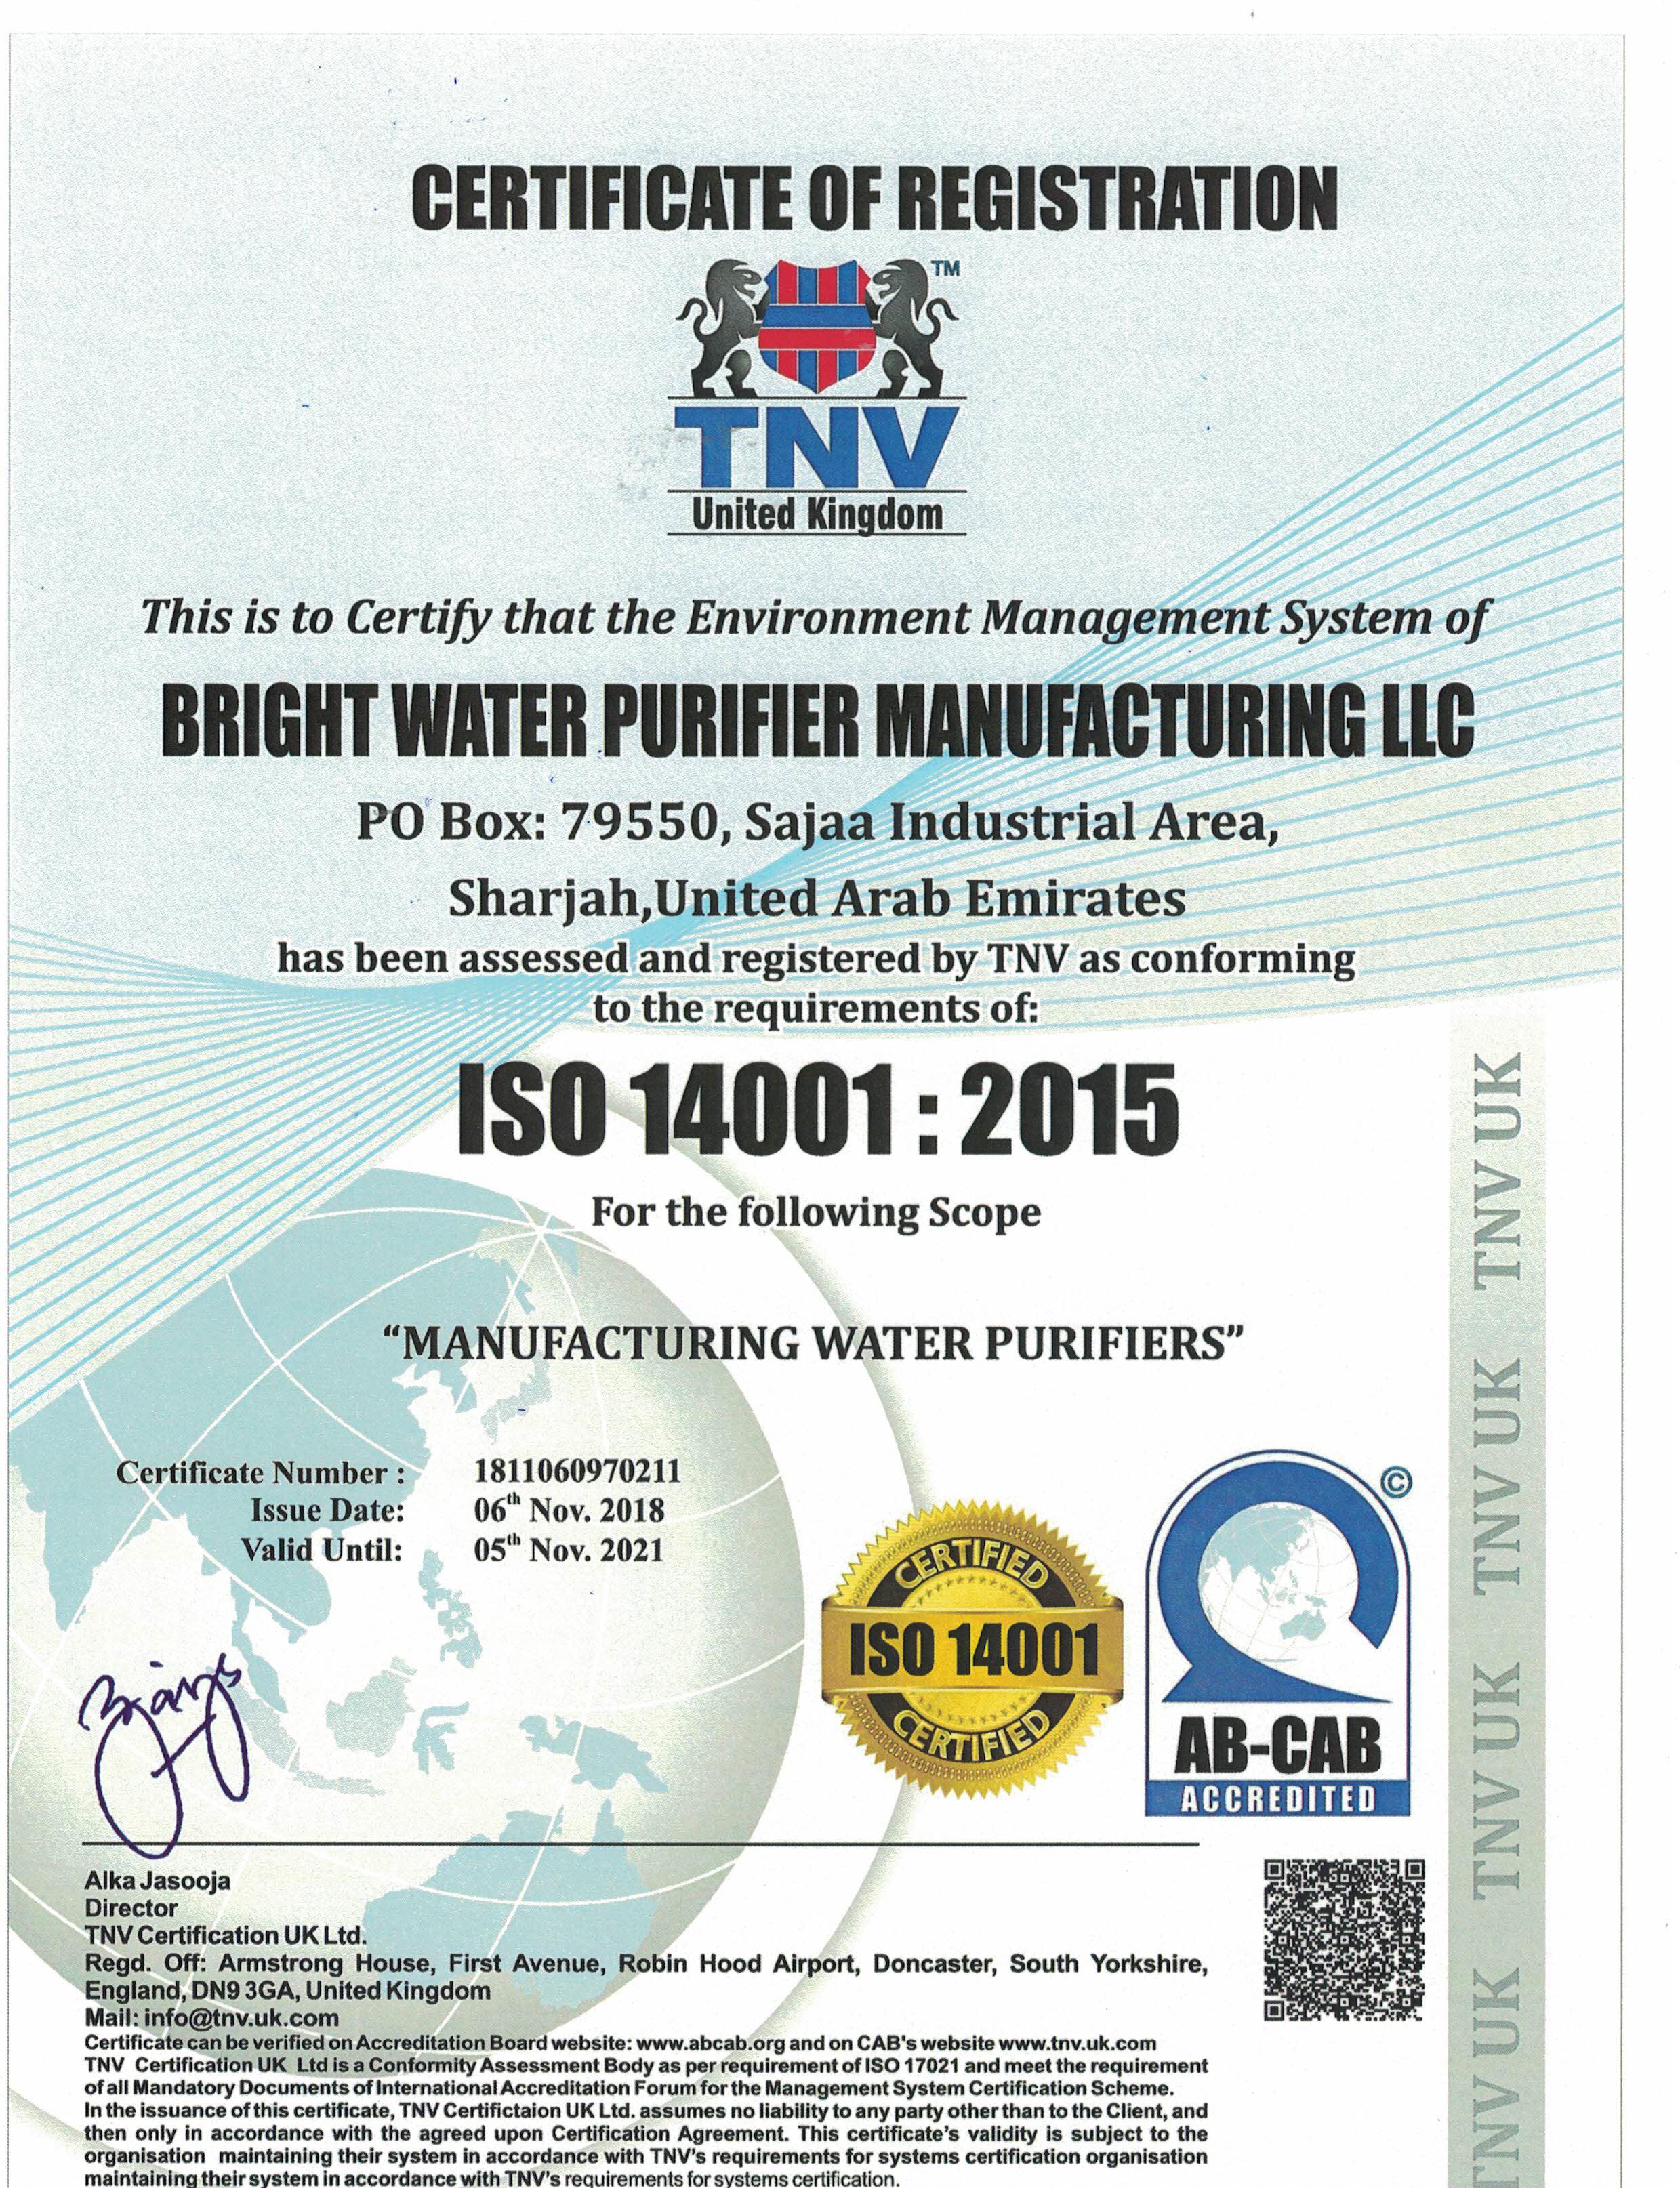 BRIGHT WATER PURIFIER MANUFACTURING LLC